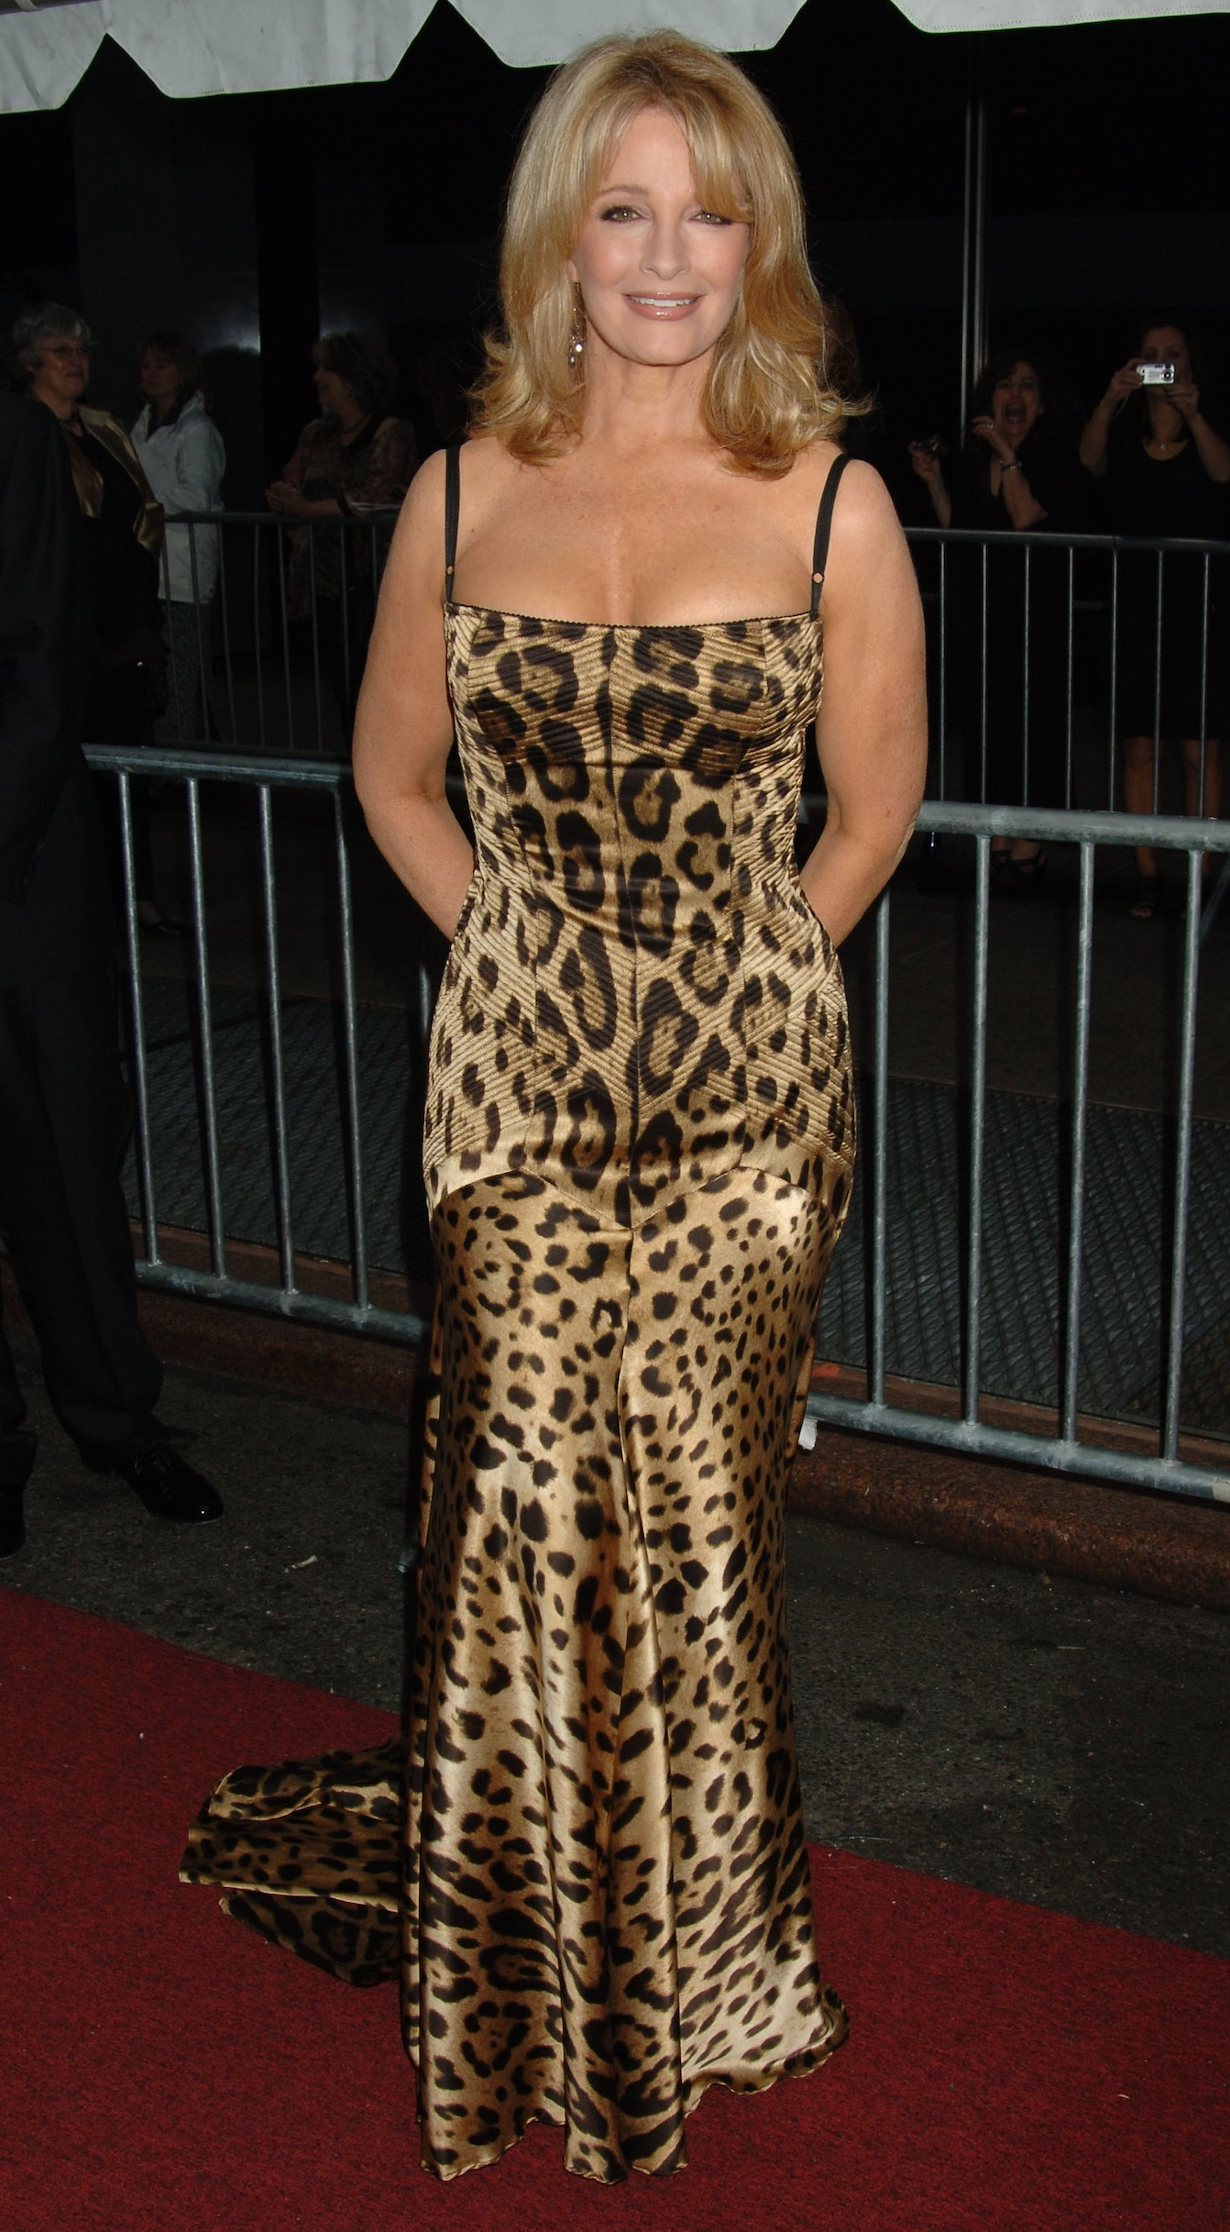 Deidre Hall 32nd Annual Daytime Emmy Award - Arrivals Radio City Music Hall New York, NY 5/20/05 �Jennifer Graylock/jpistudios.com 310-657-9661